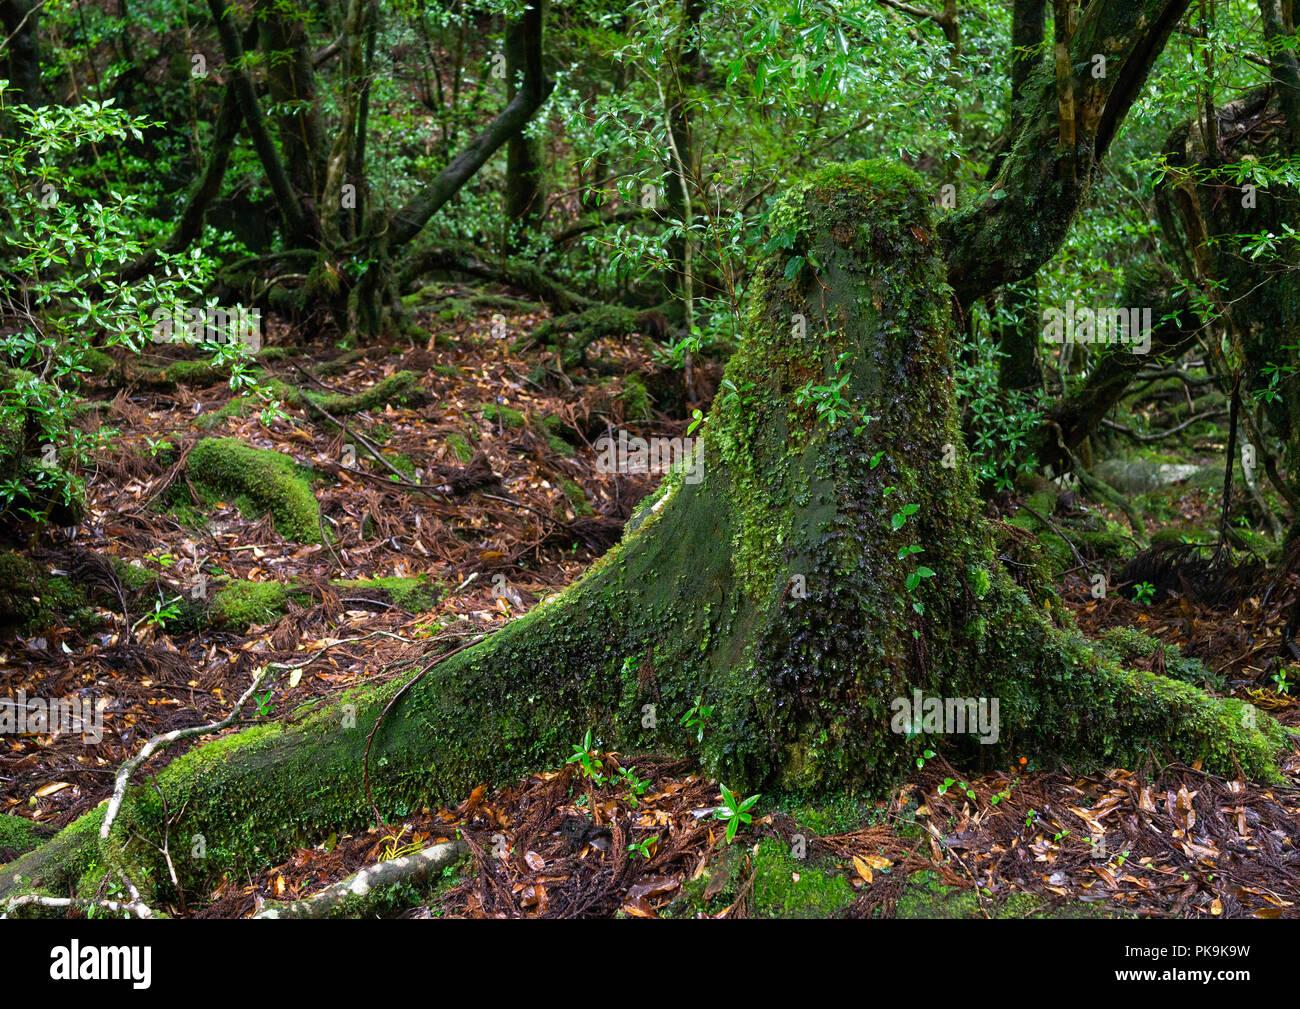 Tree trunk with moss in Yakusugi land, Kagoshima Prefecture, Yakushima, Japan Stock Photo